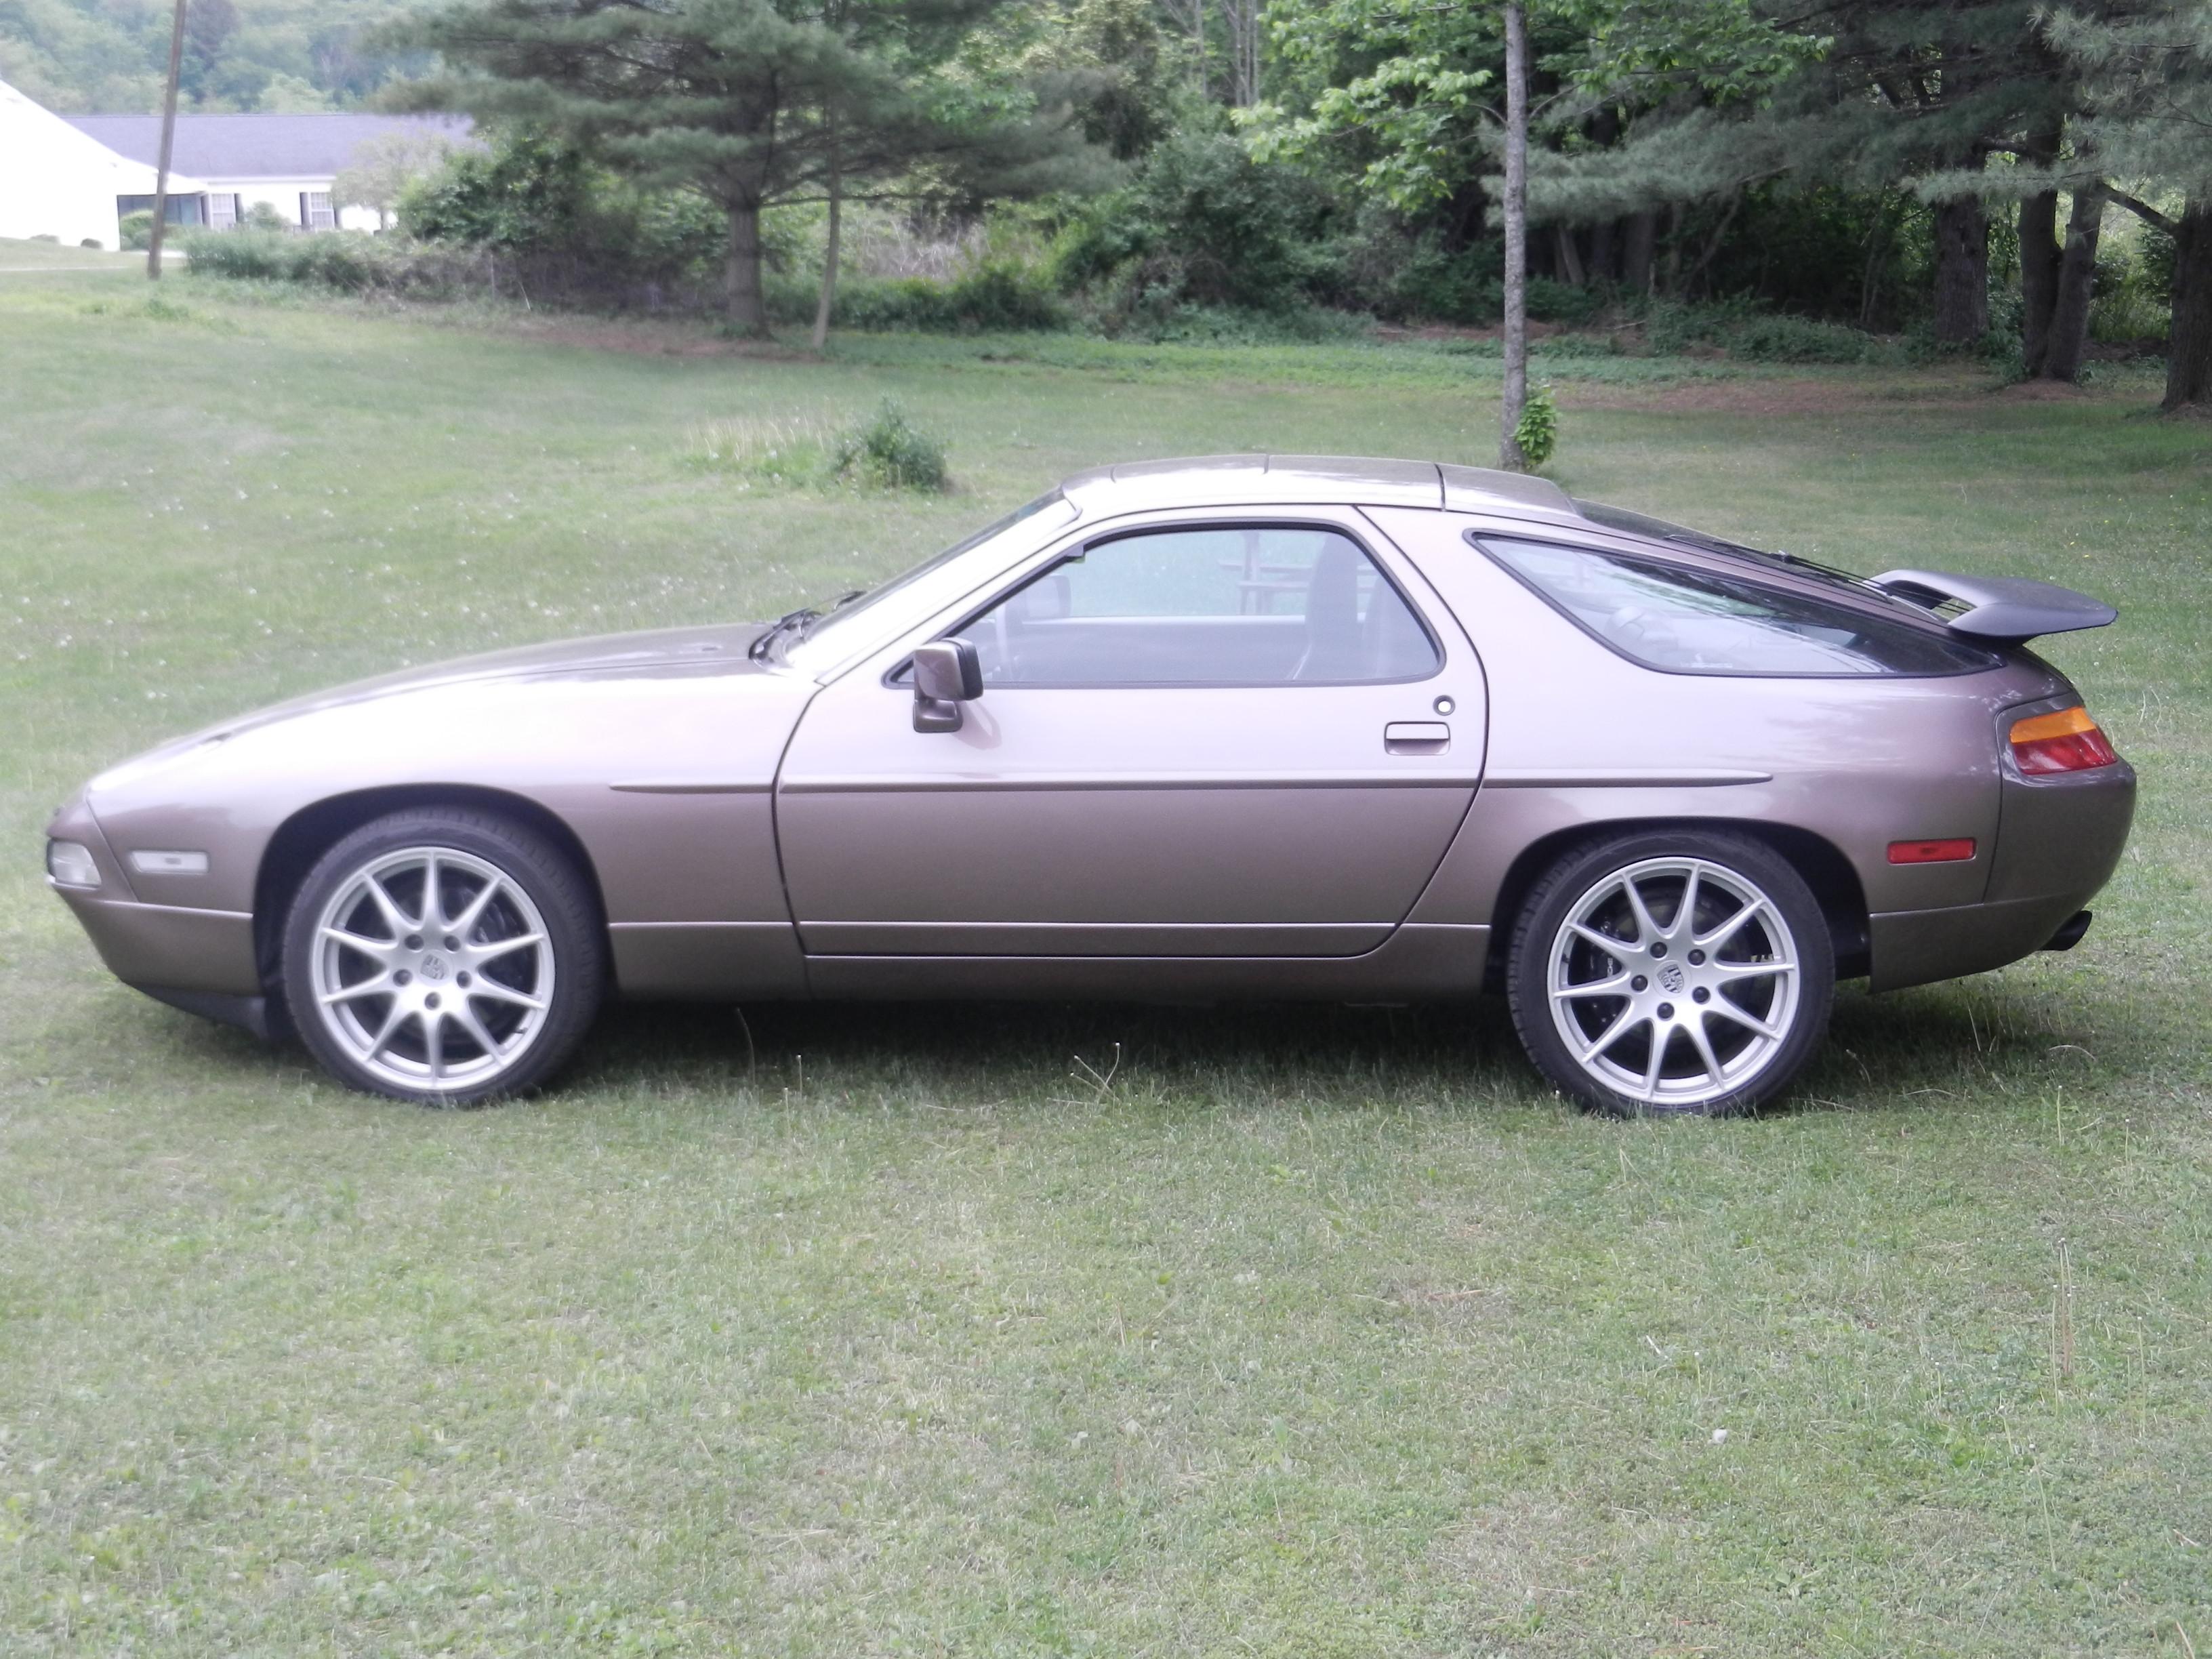 Cars For Sale Donovan Motorcar Service Lenox MA – Classic